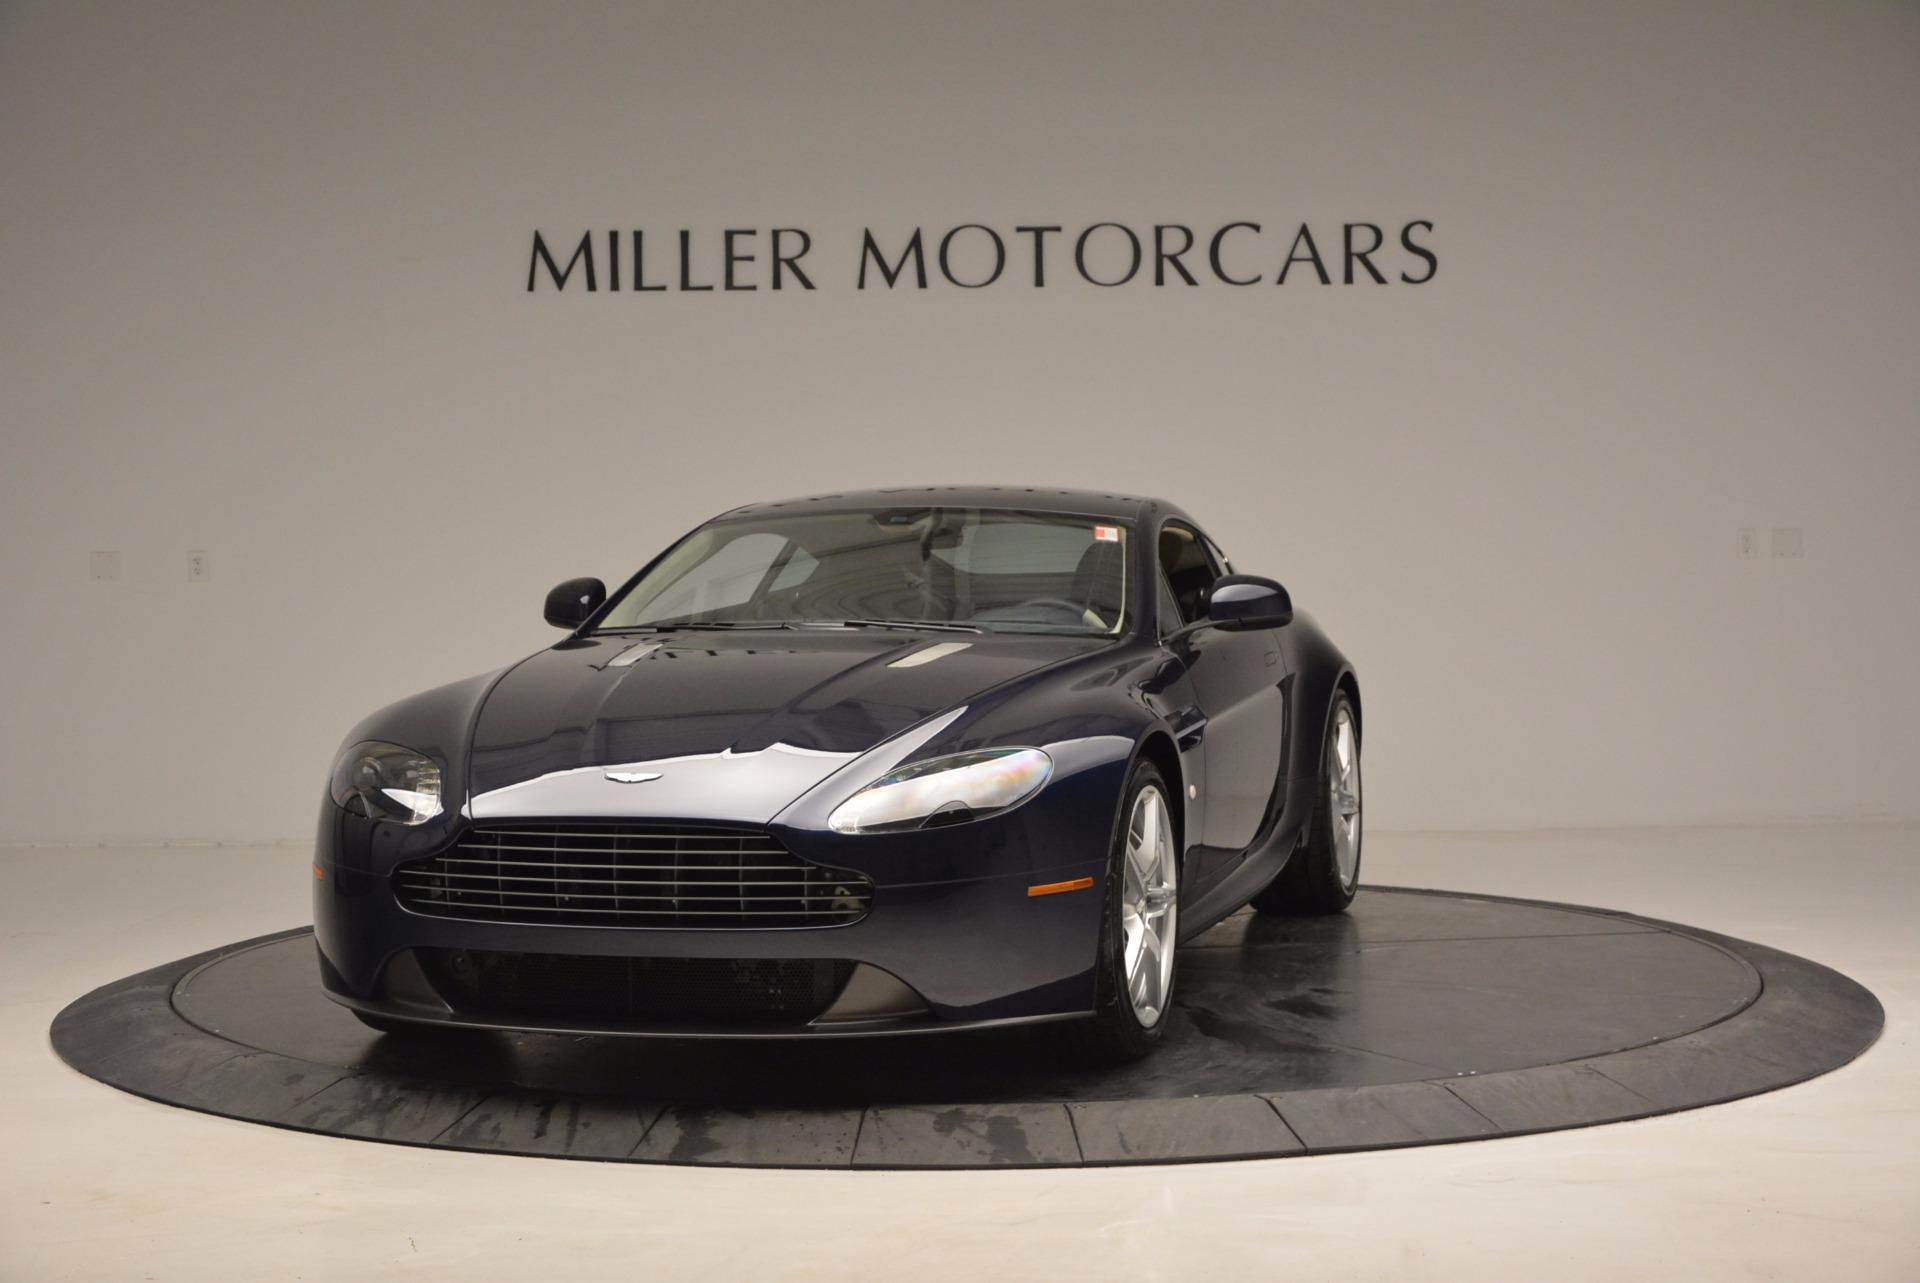 Used 2016 Aston Martin V8 Vantage for sale Sold at Bugatti of Greenwich in Greenwich CT 06830 1